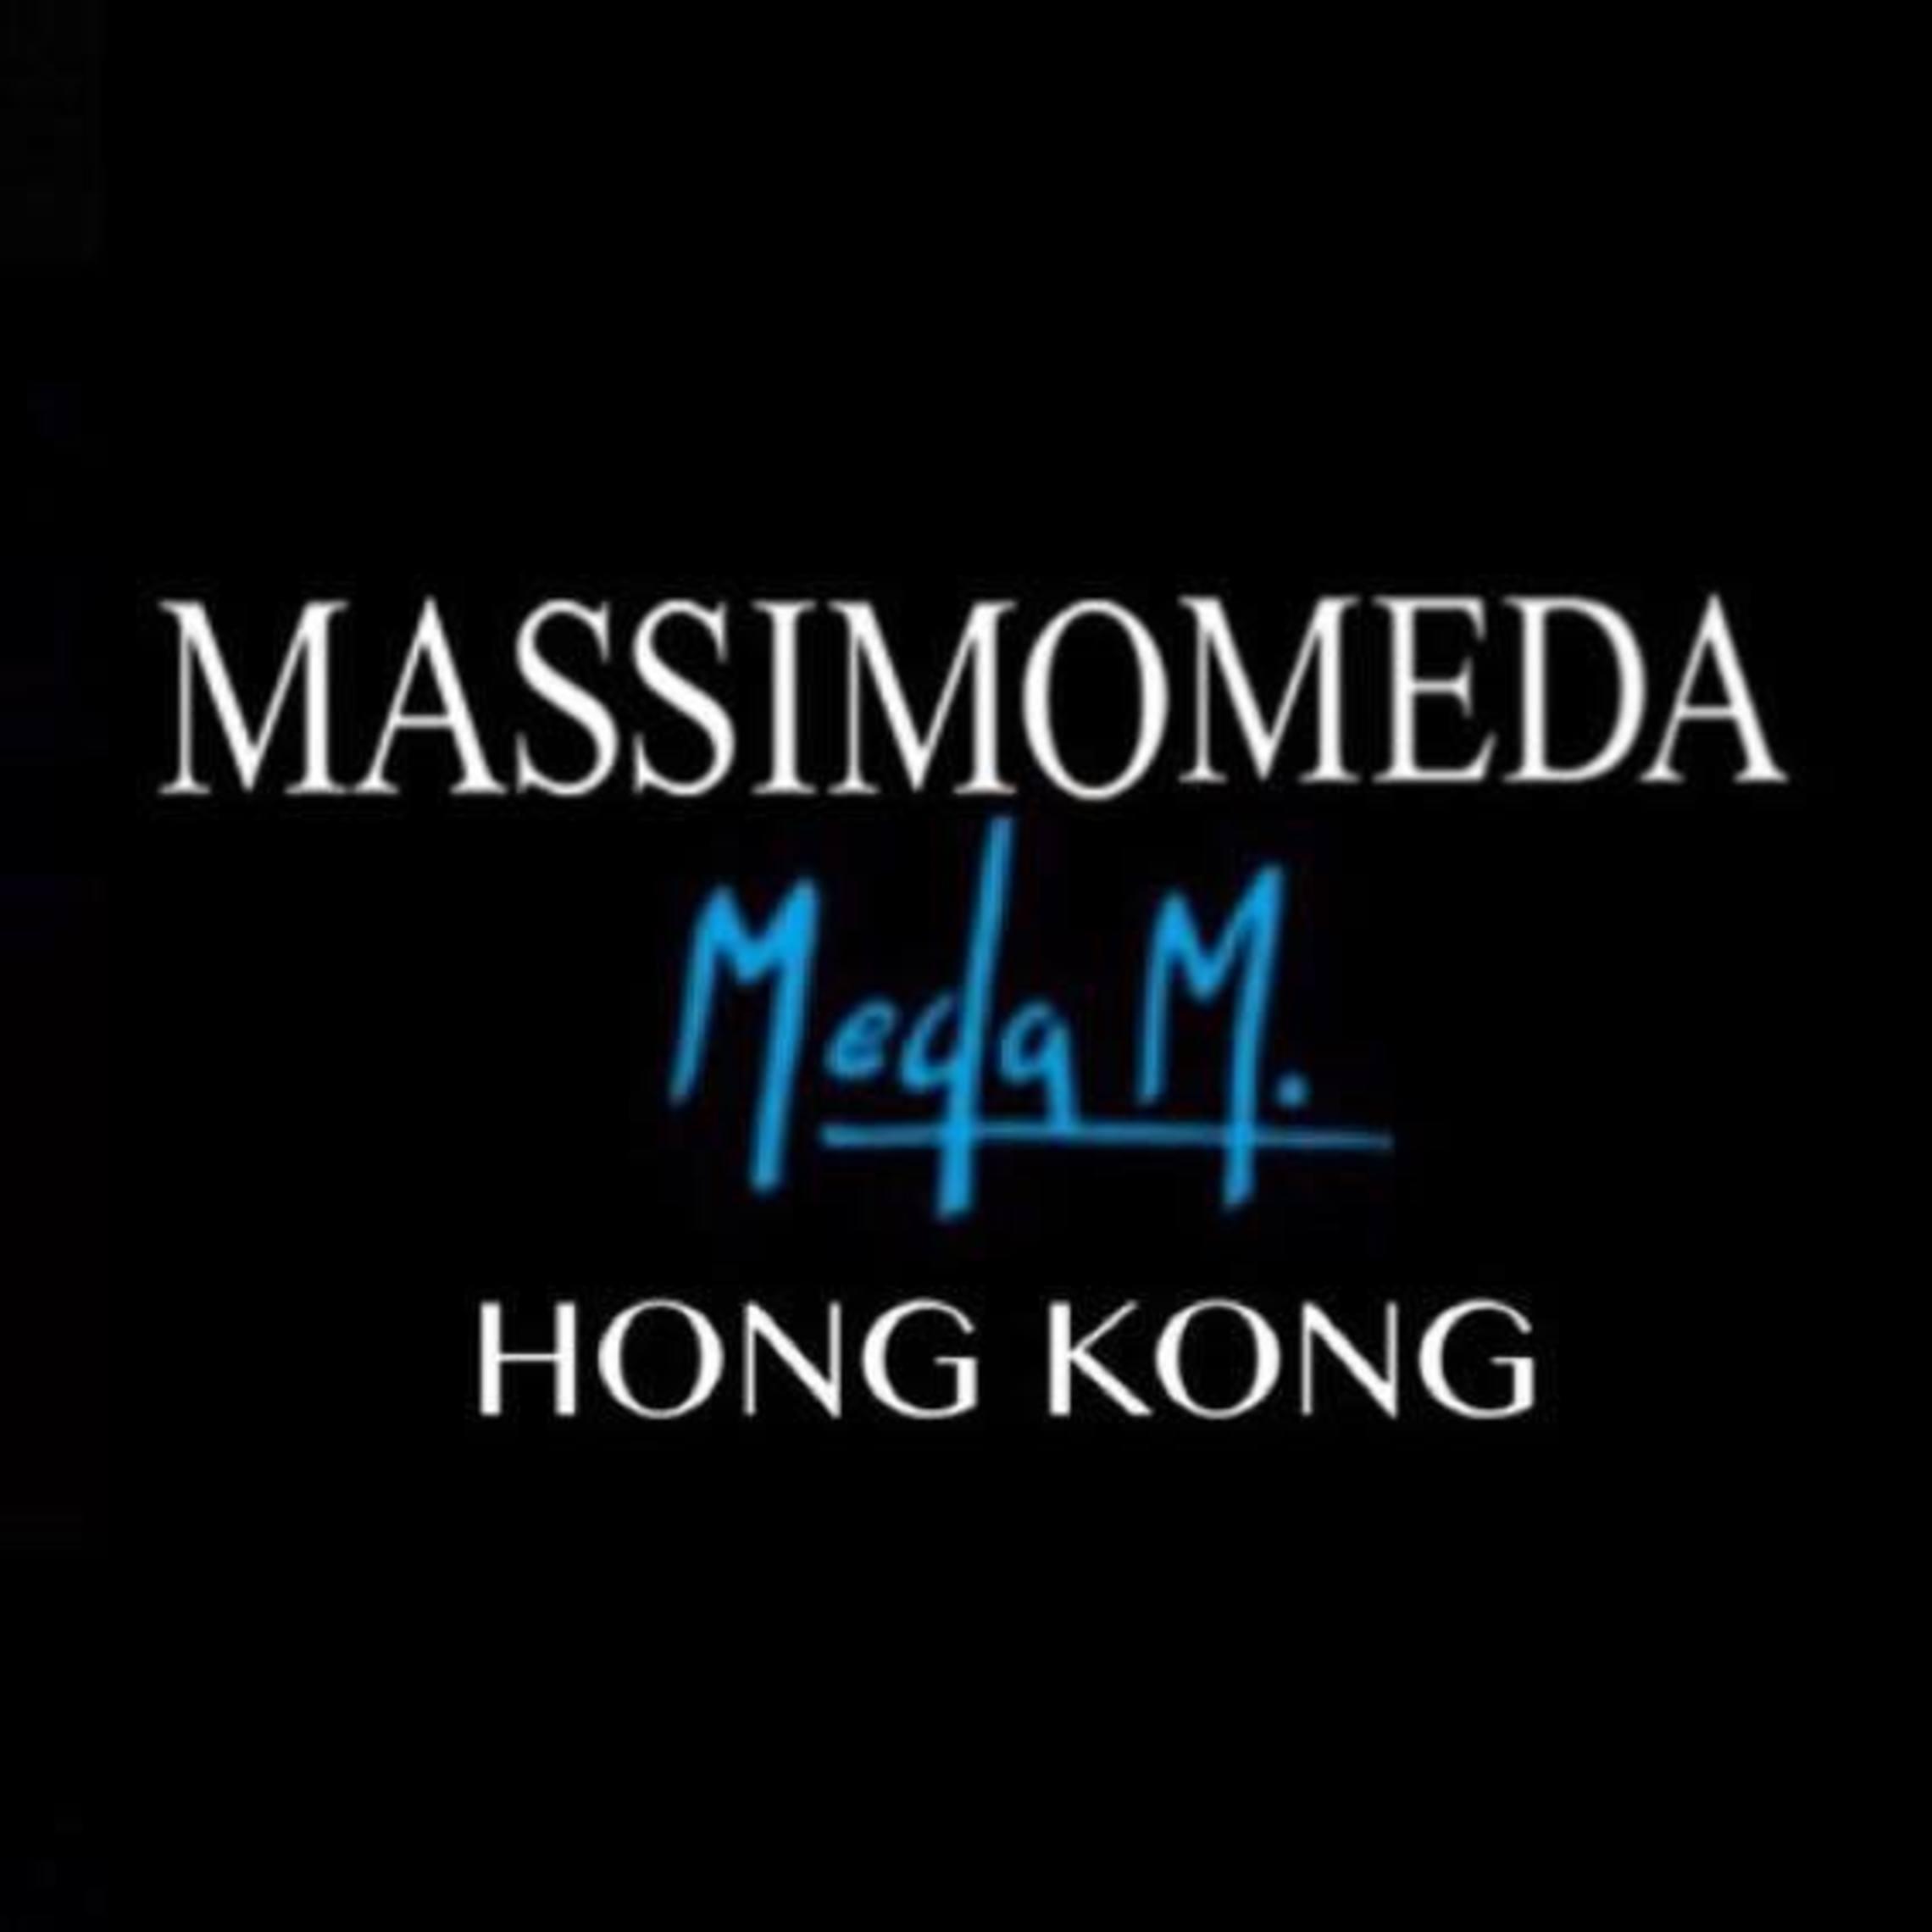 massimo meda hong- company logo